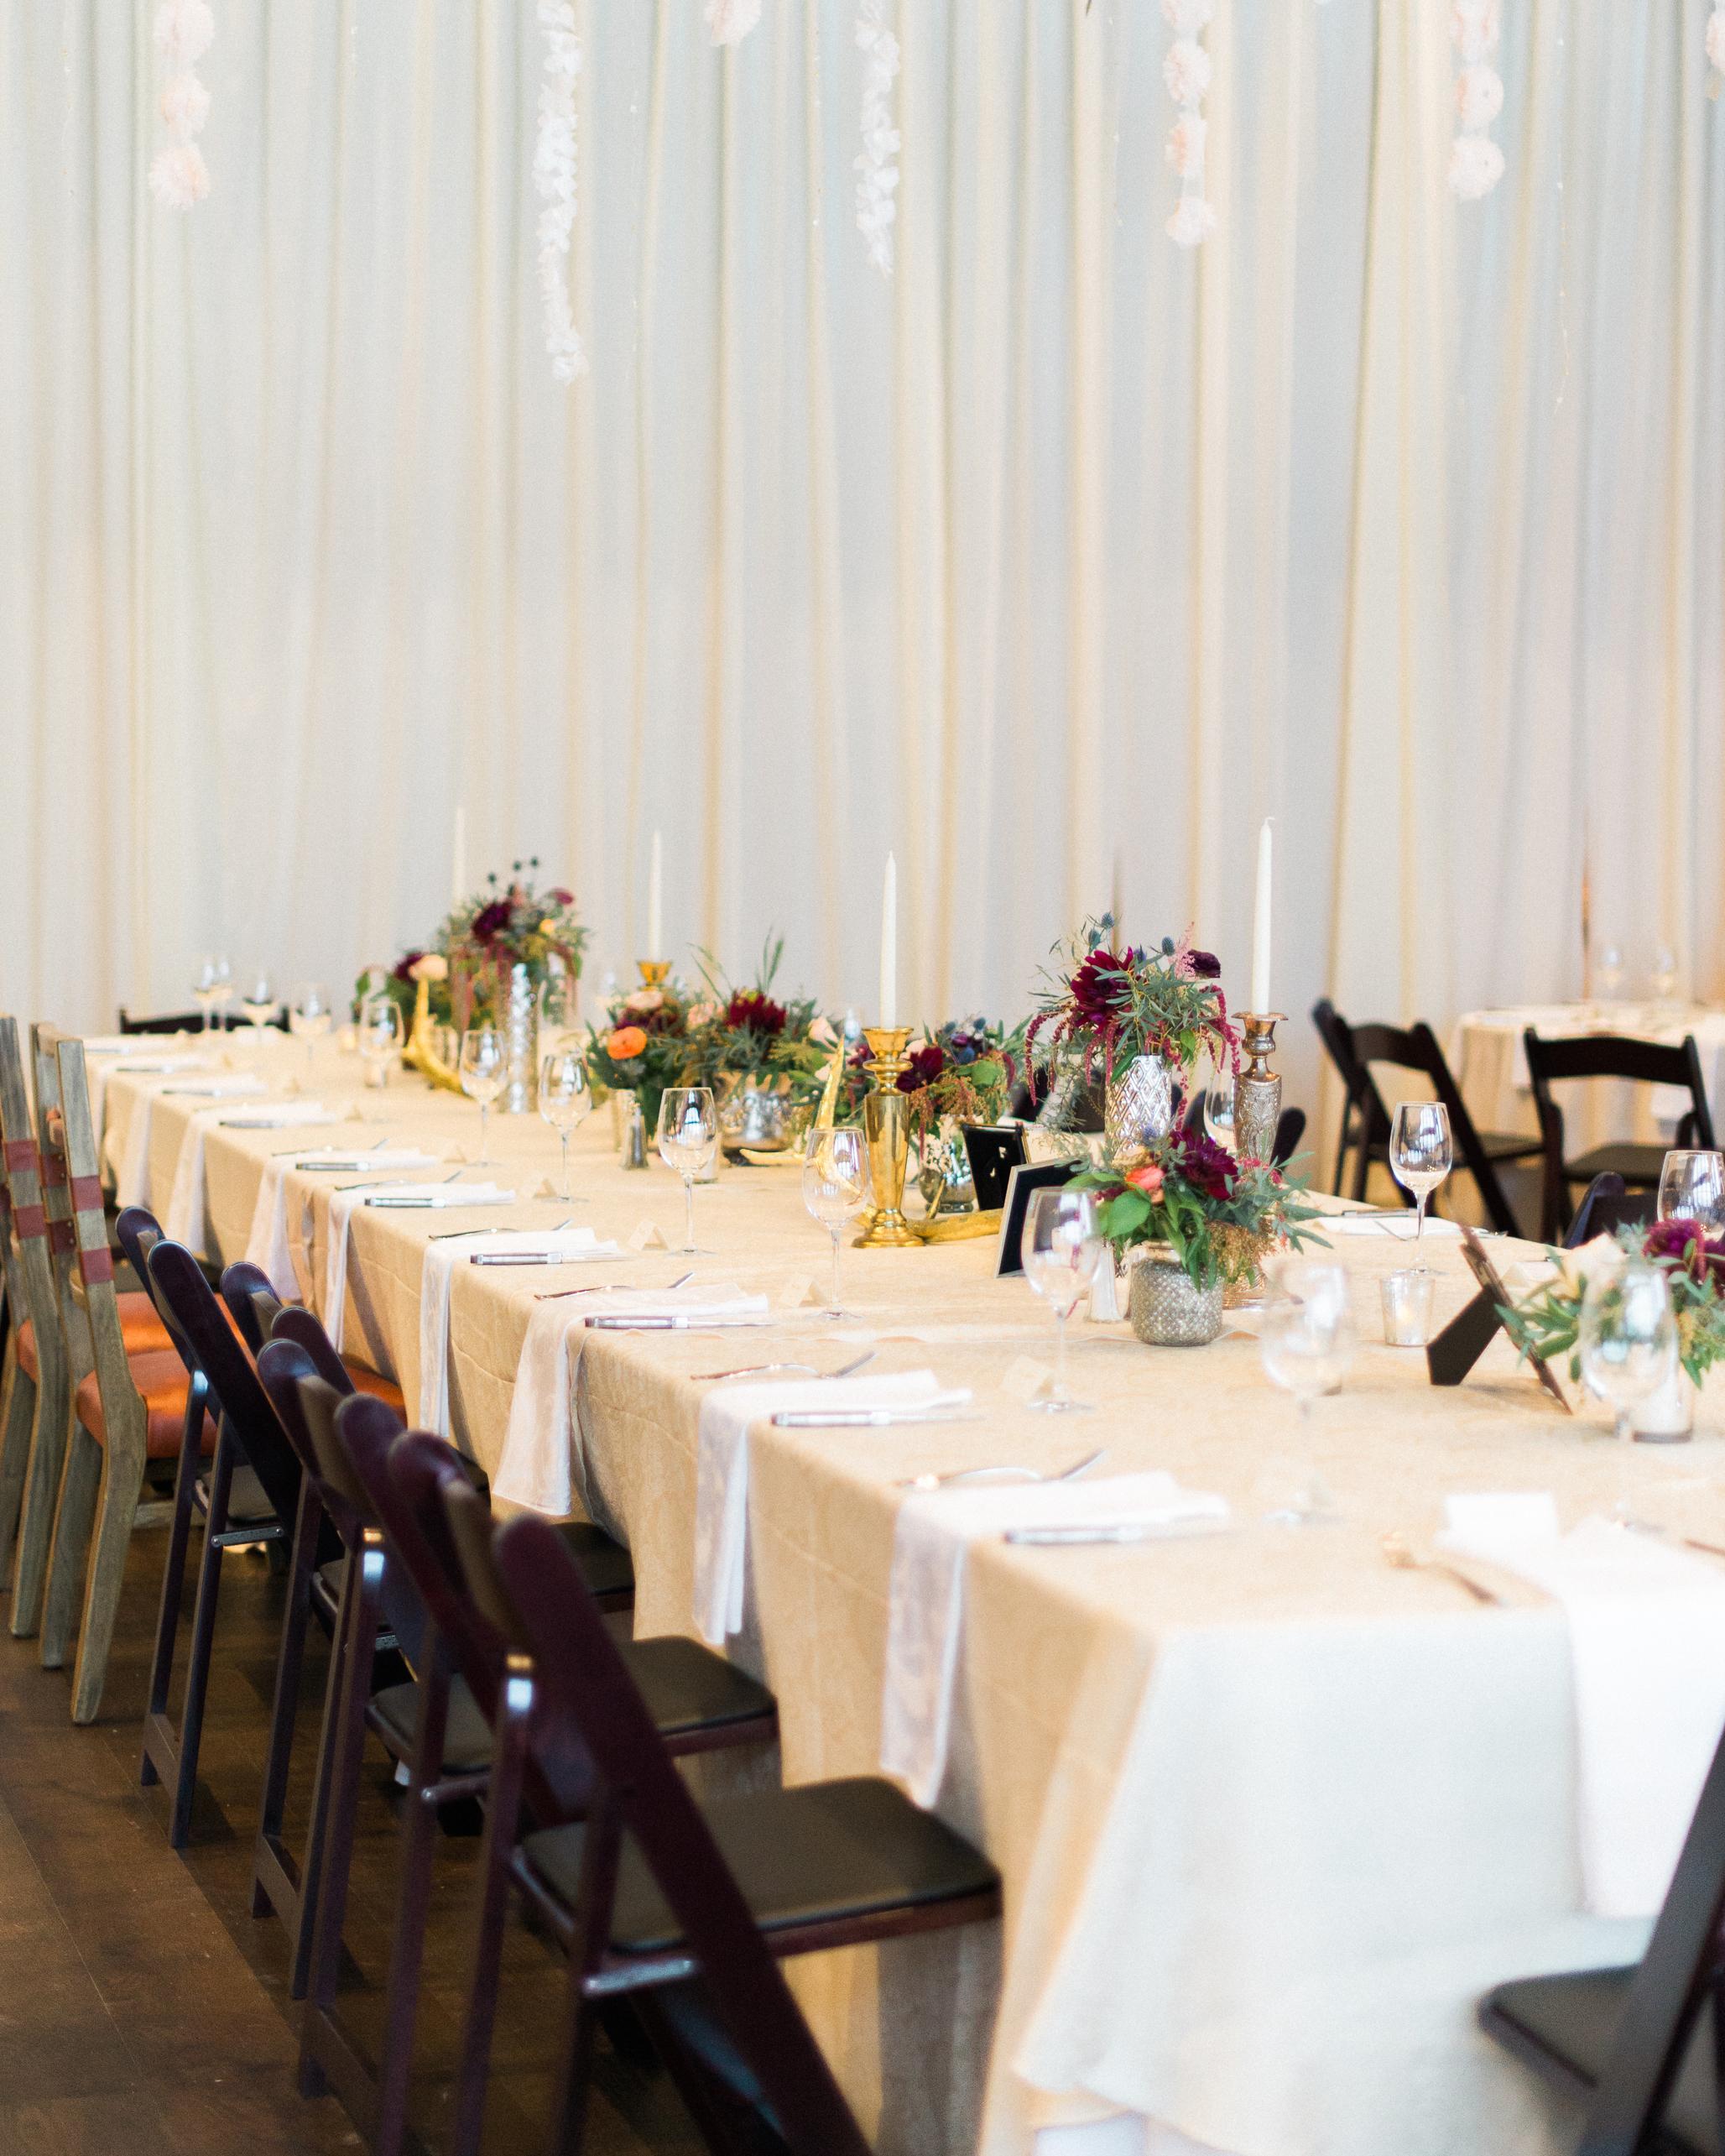 tiffany-nicholas-wedding-tables-123-s111339-0714.jpg